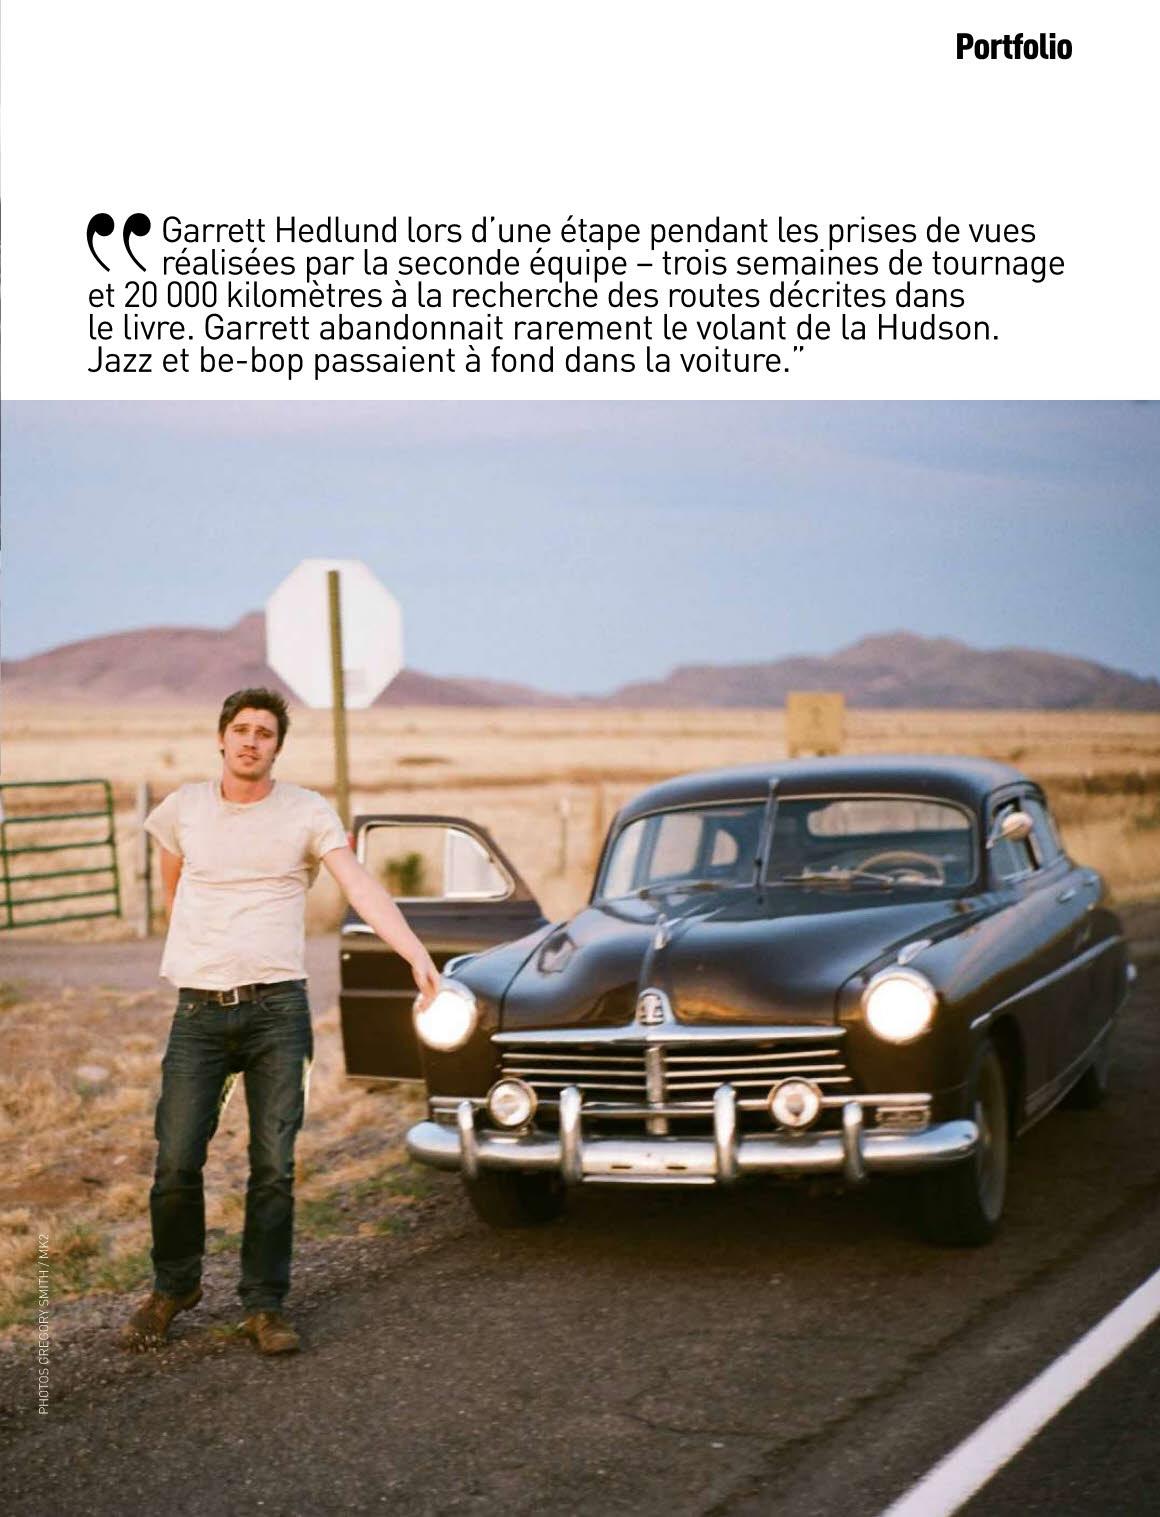 HQ Premiere Magazine Scans